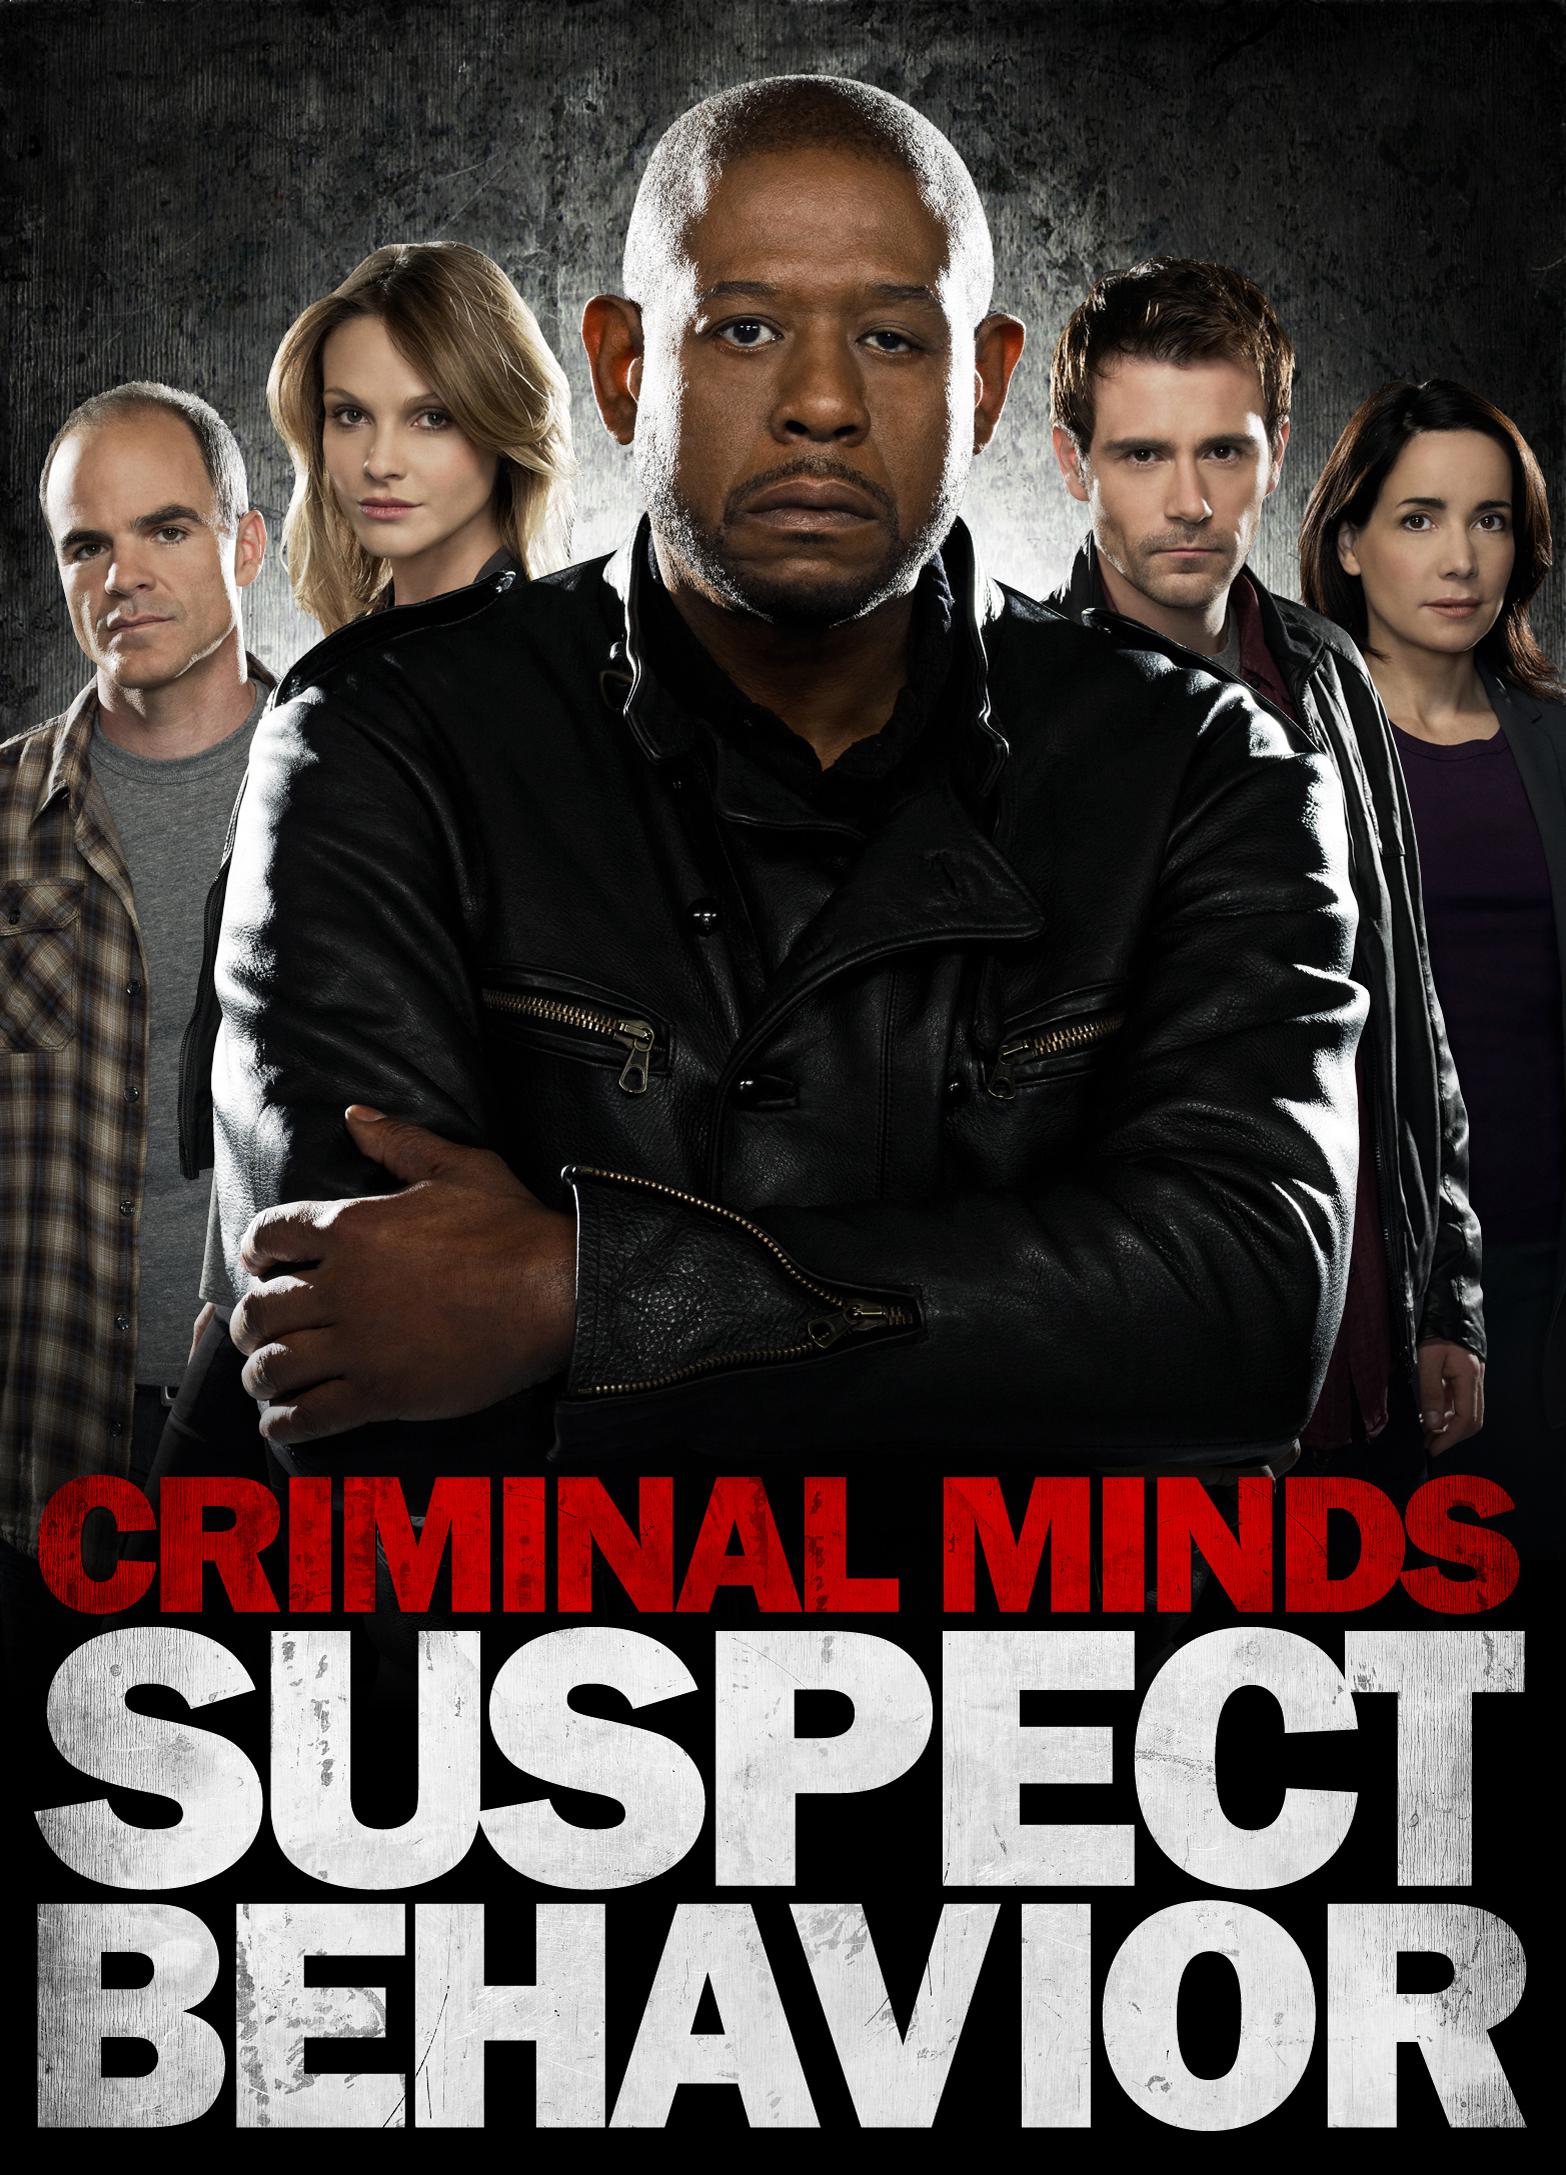 Criminal Minds: Suspect Behavior (TV Series 2011) - IMDb